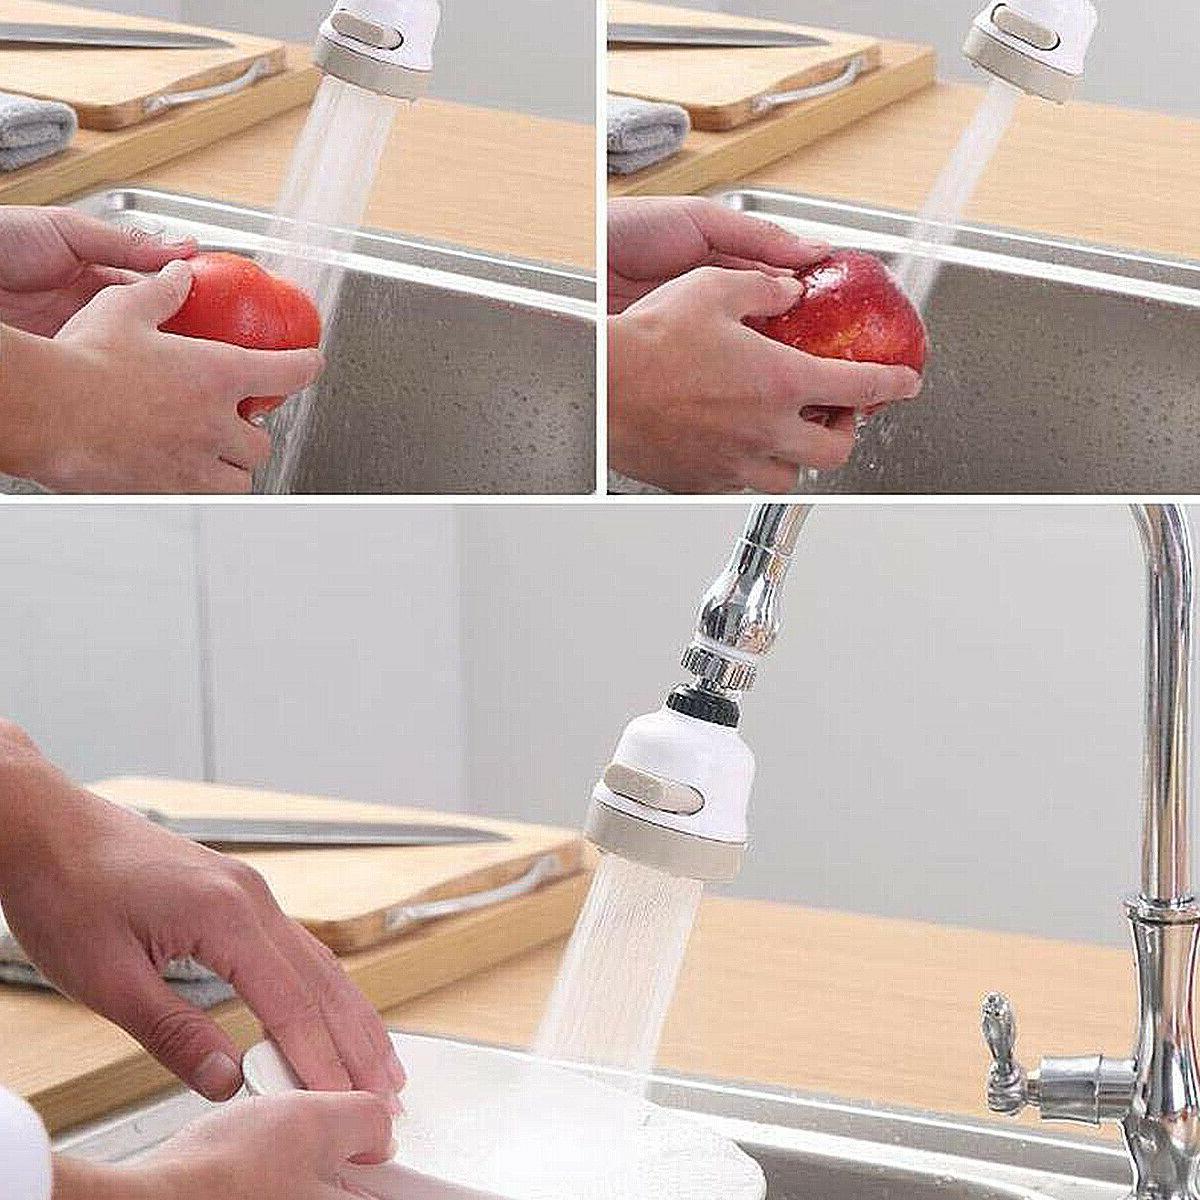 8Kitchen Tap Faucet Sink Spray Aerator